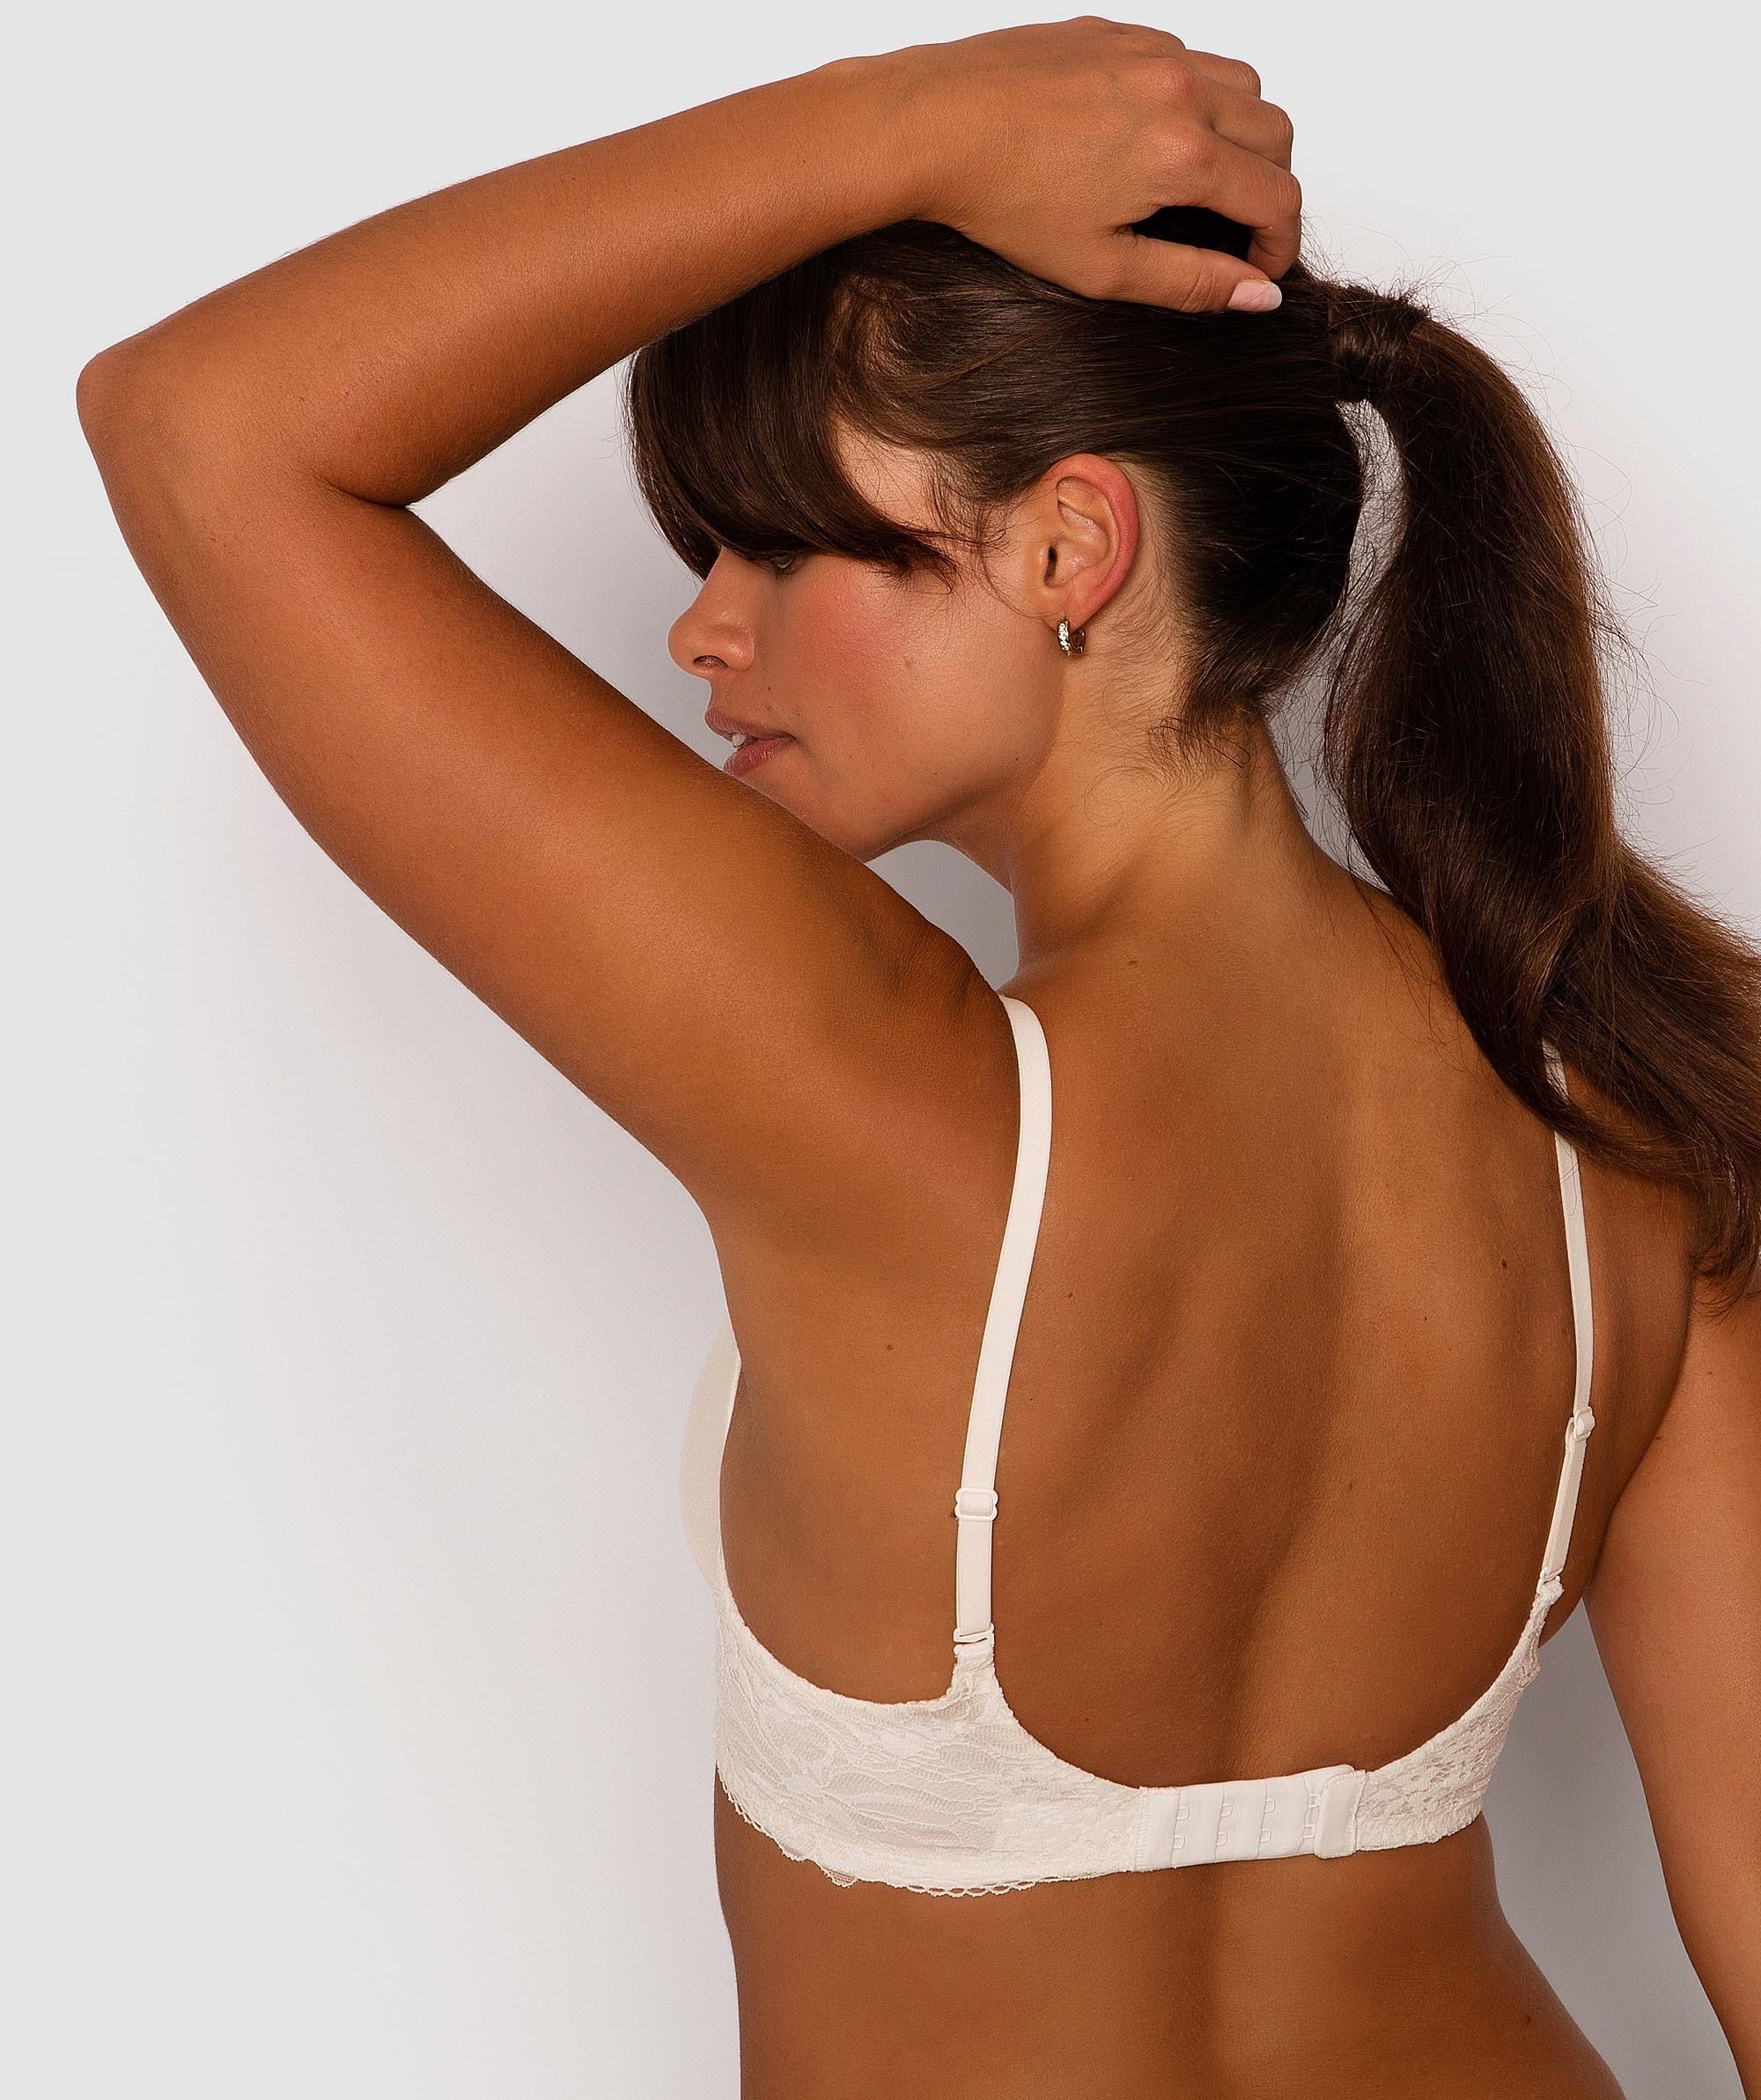 Body Bliss Lace Contour Bra - Ivory